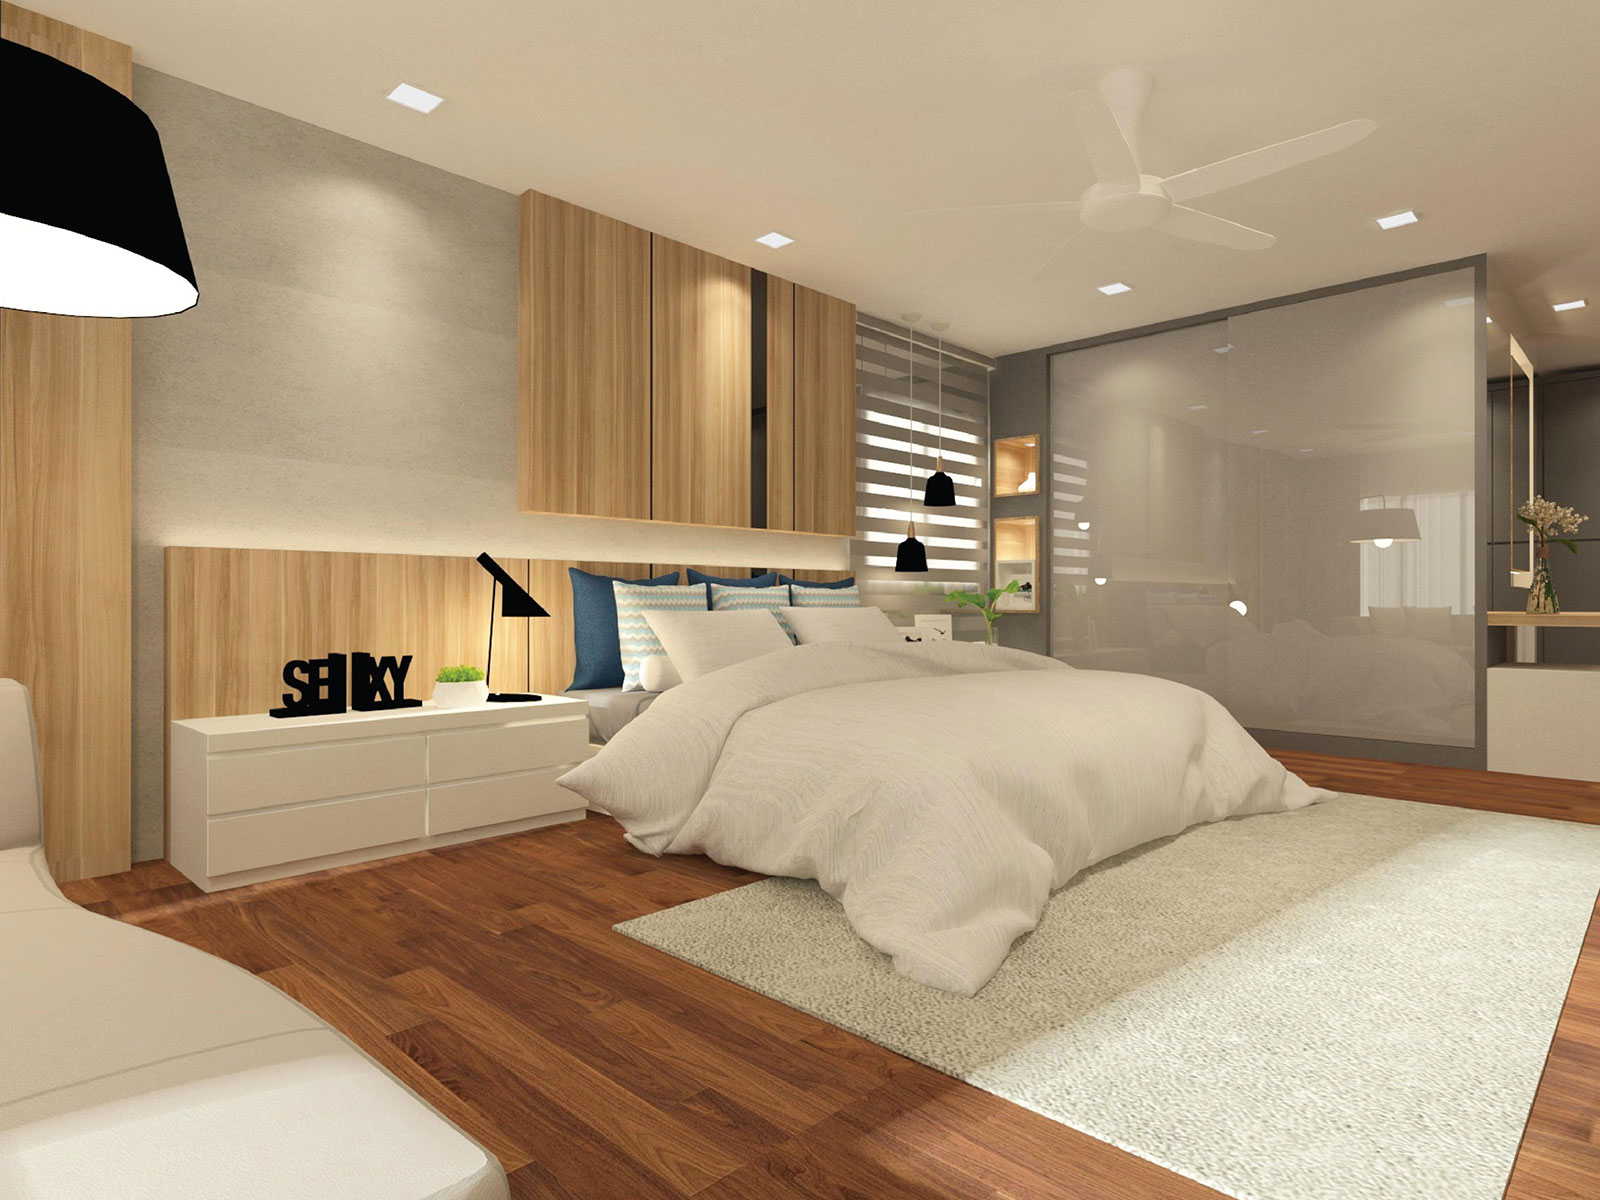 Jalil Sutera - Bukit Jalil | Interior Design Malaysia